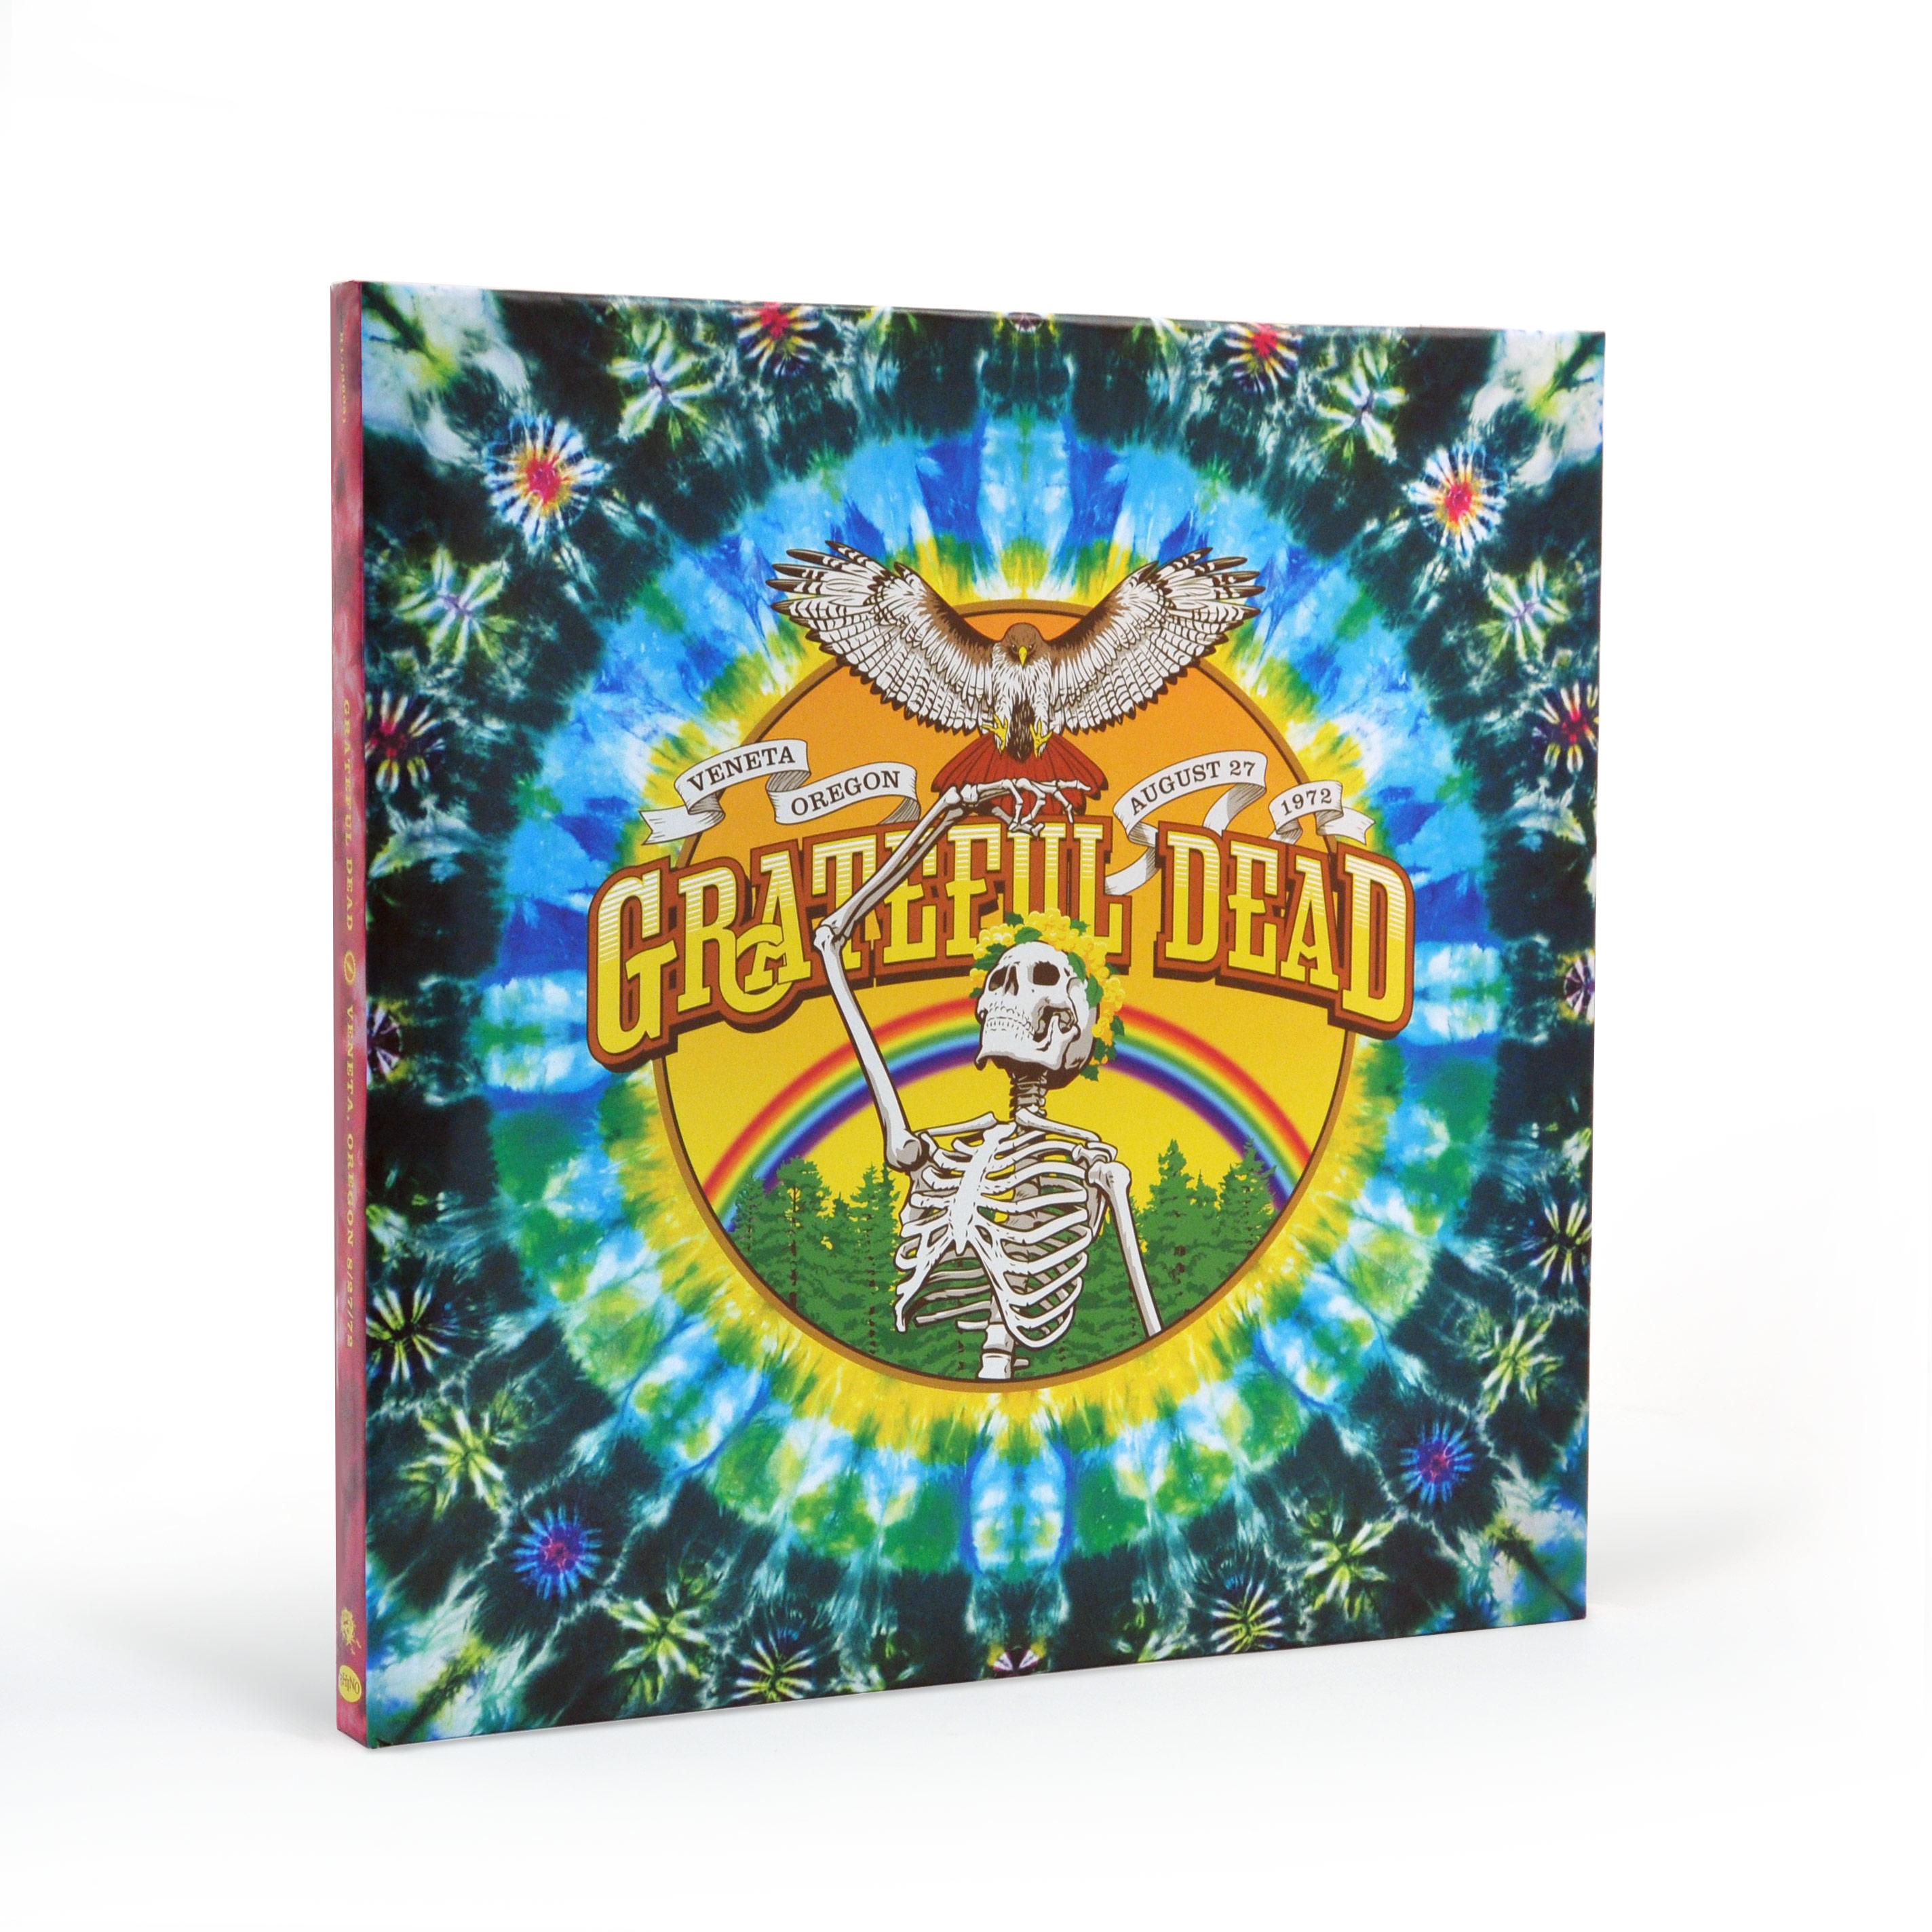 Grateful Dead 8 27 72 : sunshine daydream veneta or 8 27 72 rhino media ~ Russianpoet.info Haus und Dekorationen